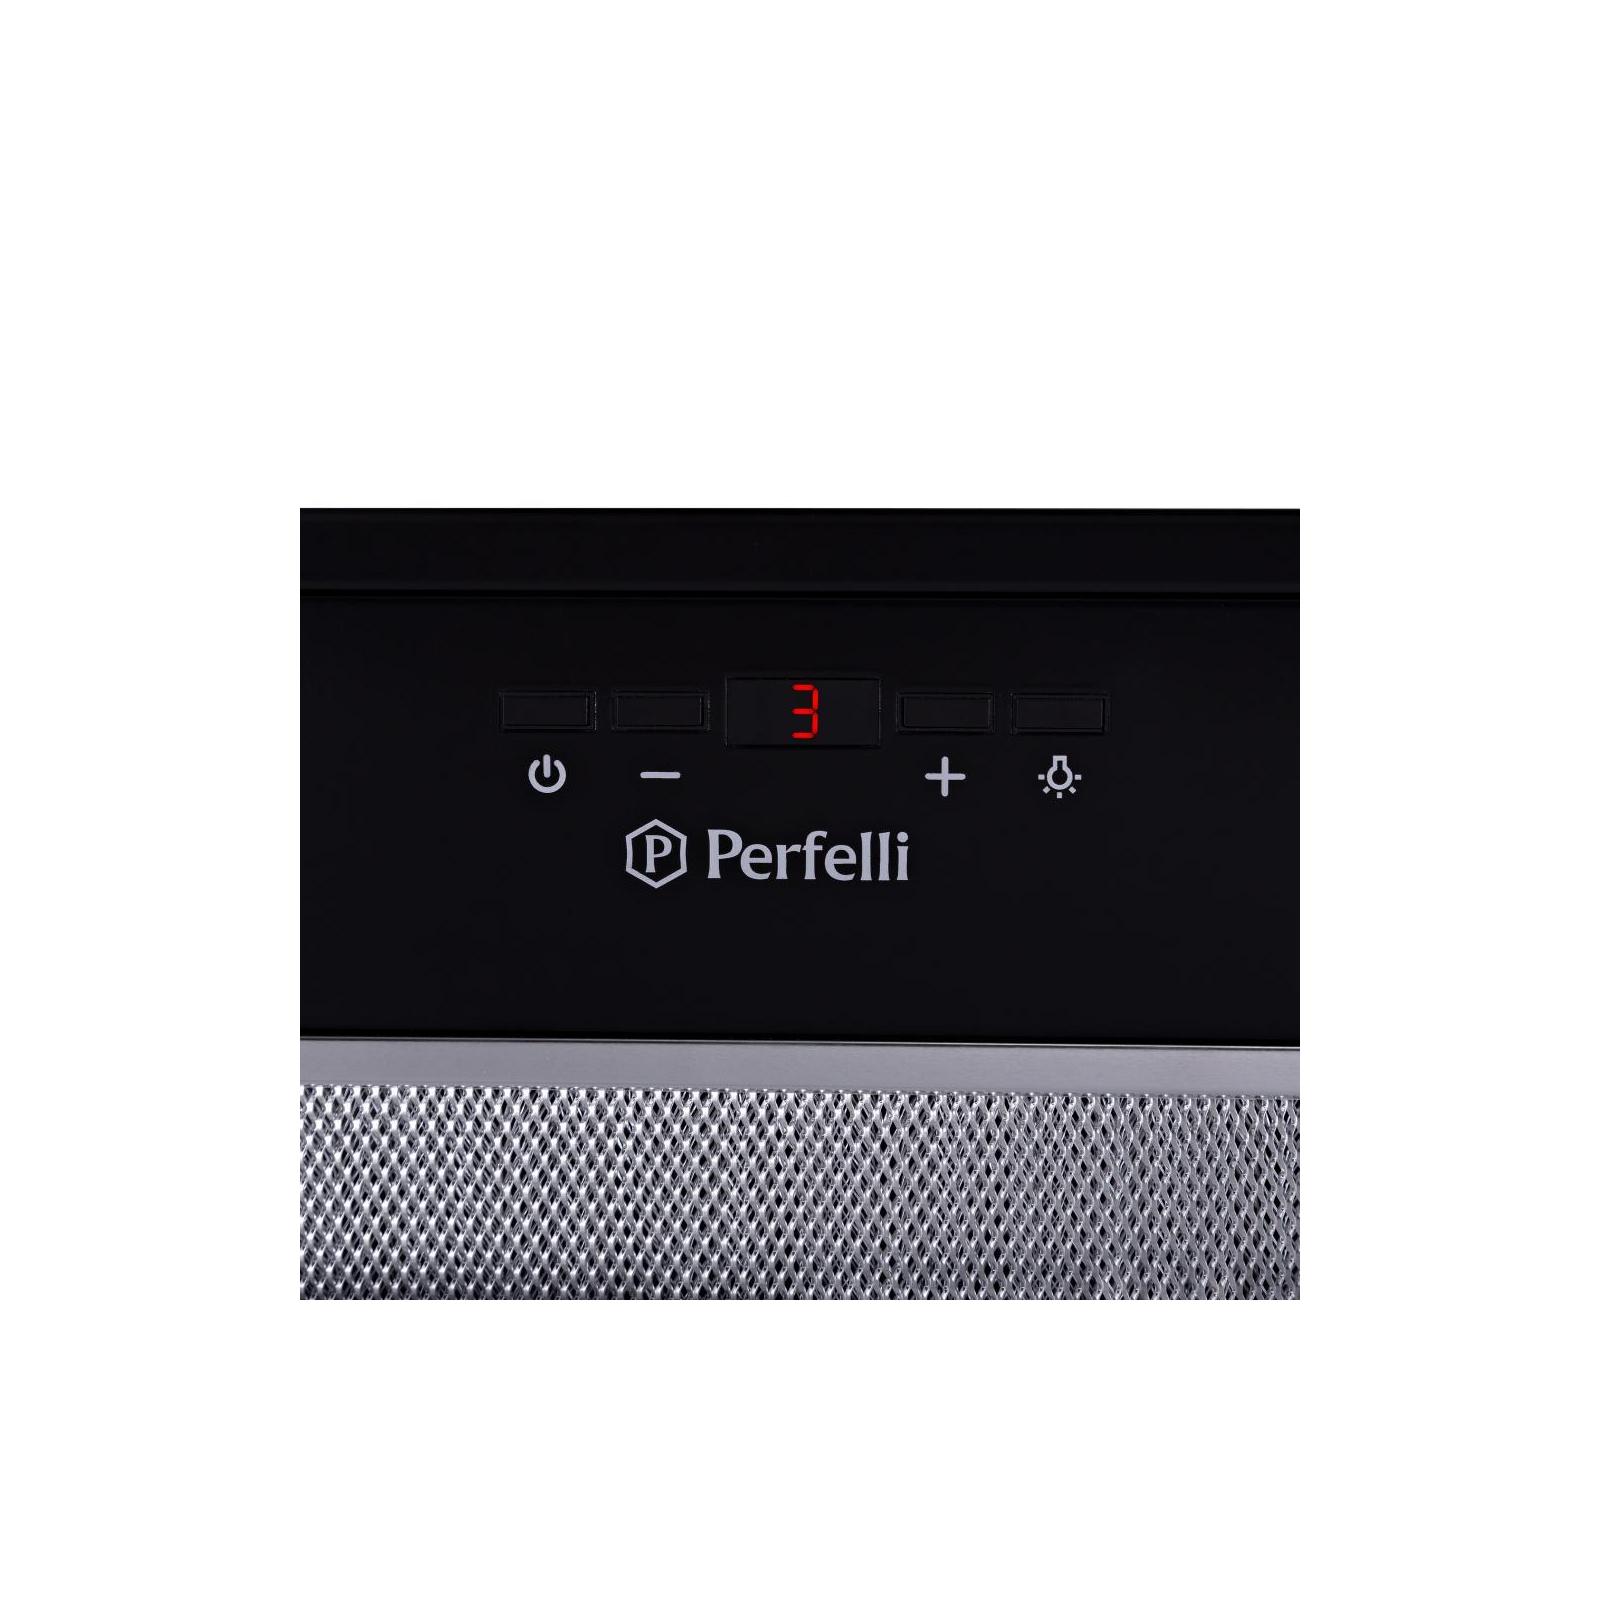 Вытяжка кухонная PERFELLI BIET 6512 A 1000 BL LED изображение 5